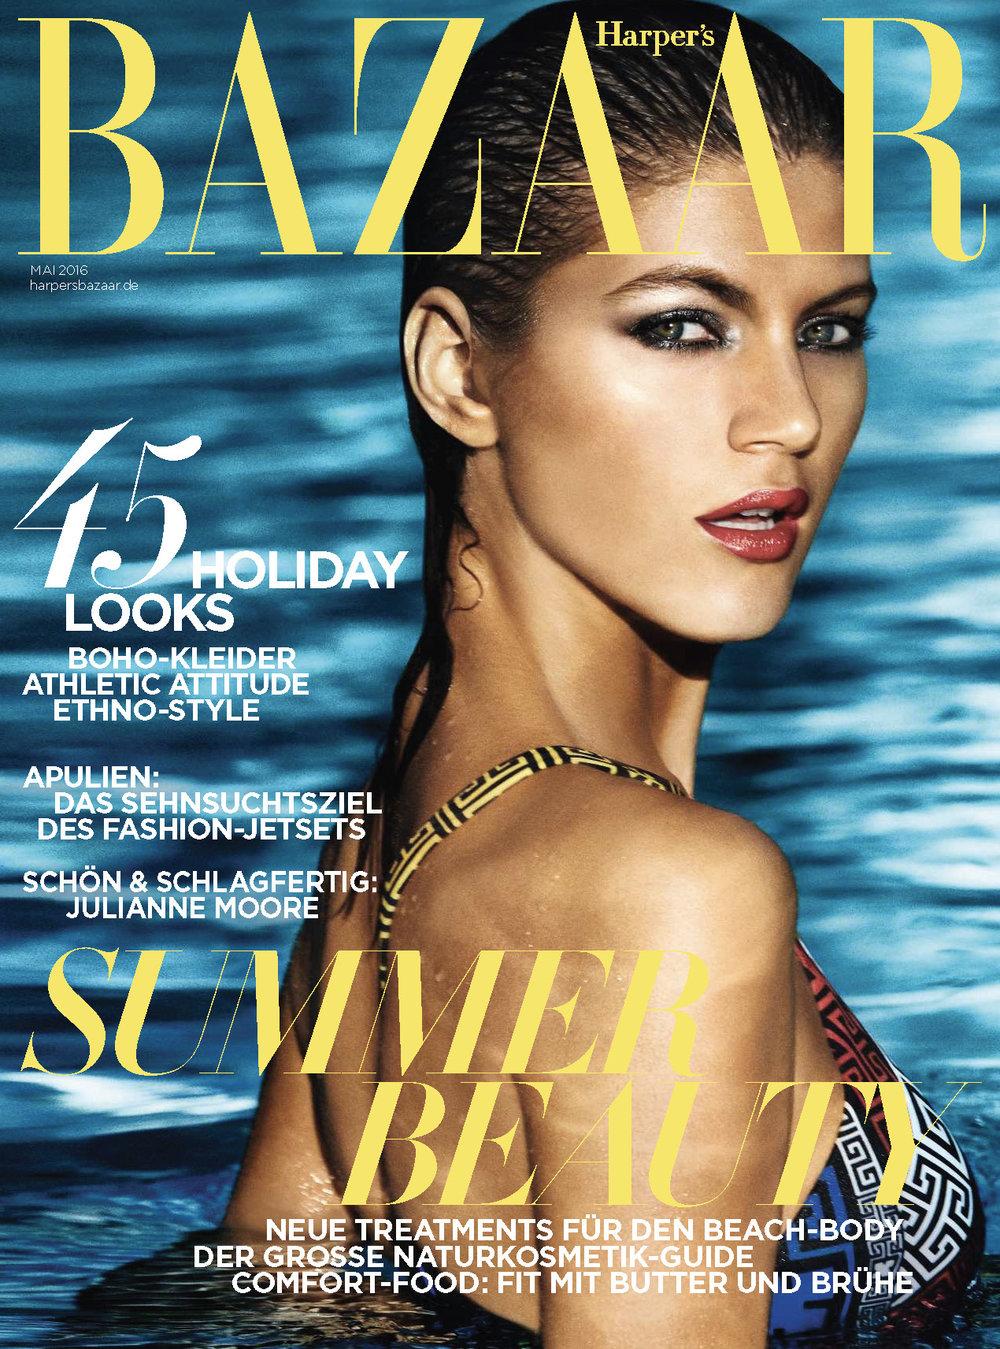 COVER Harper's Bazaar Germany - Mai 2016.jpg